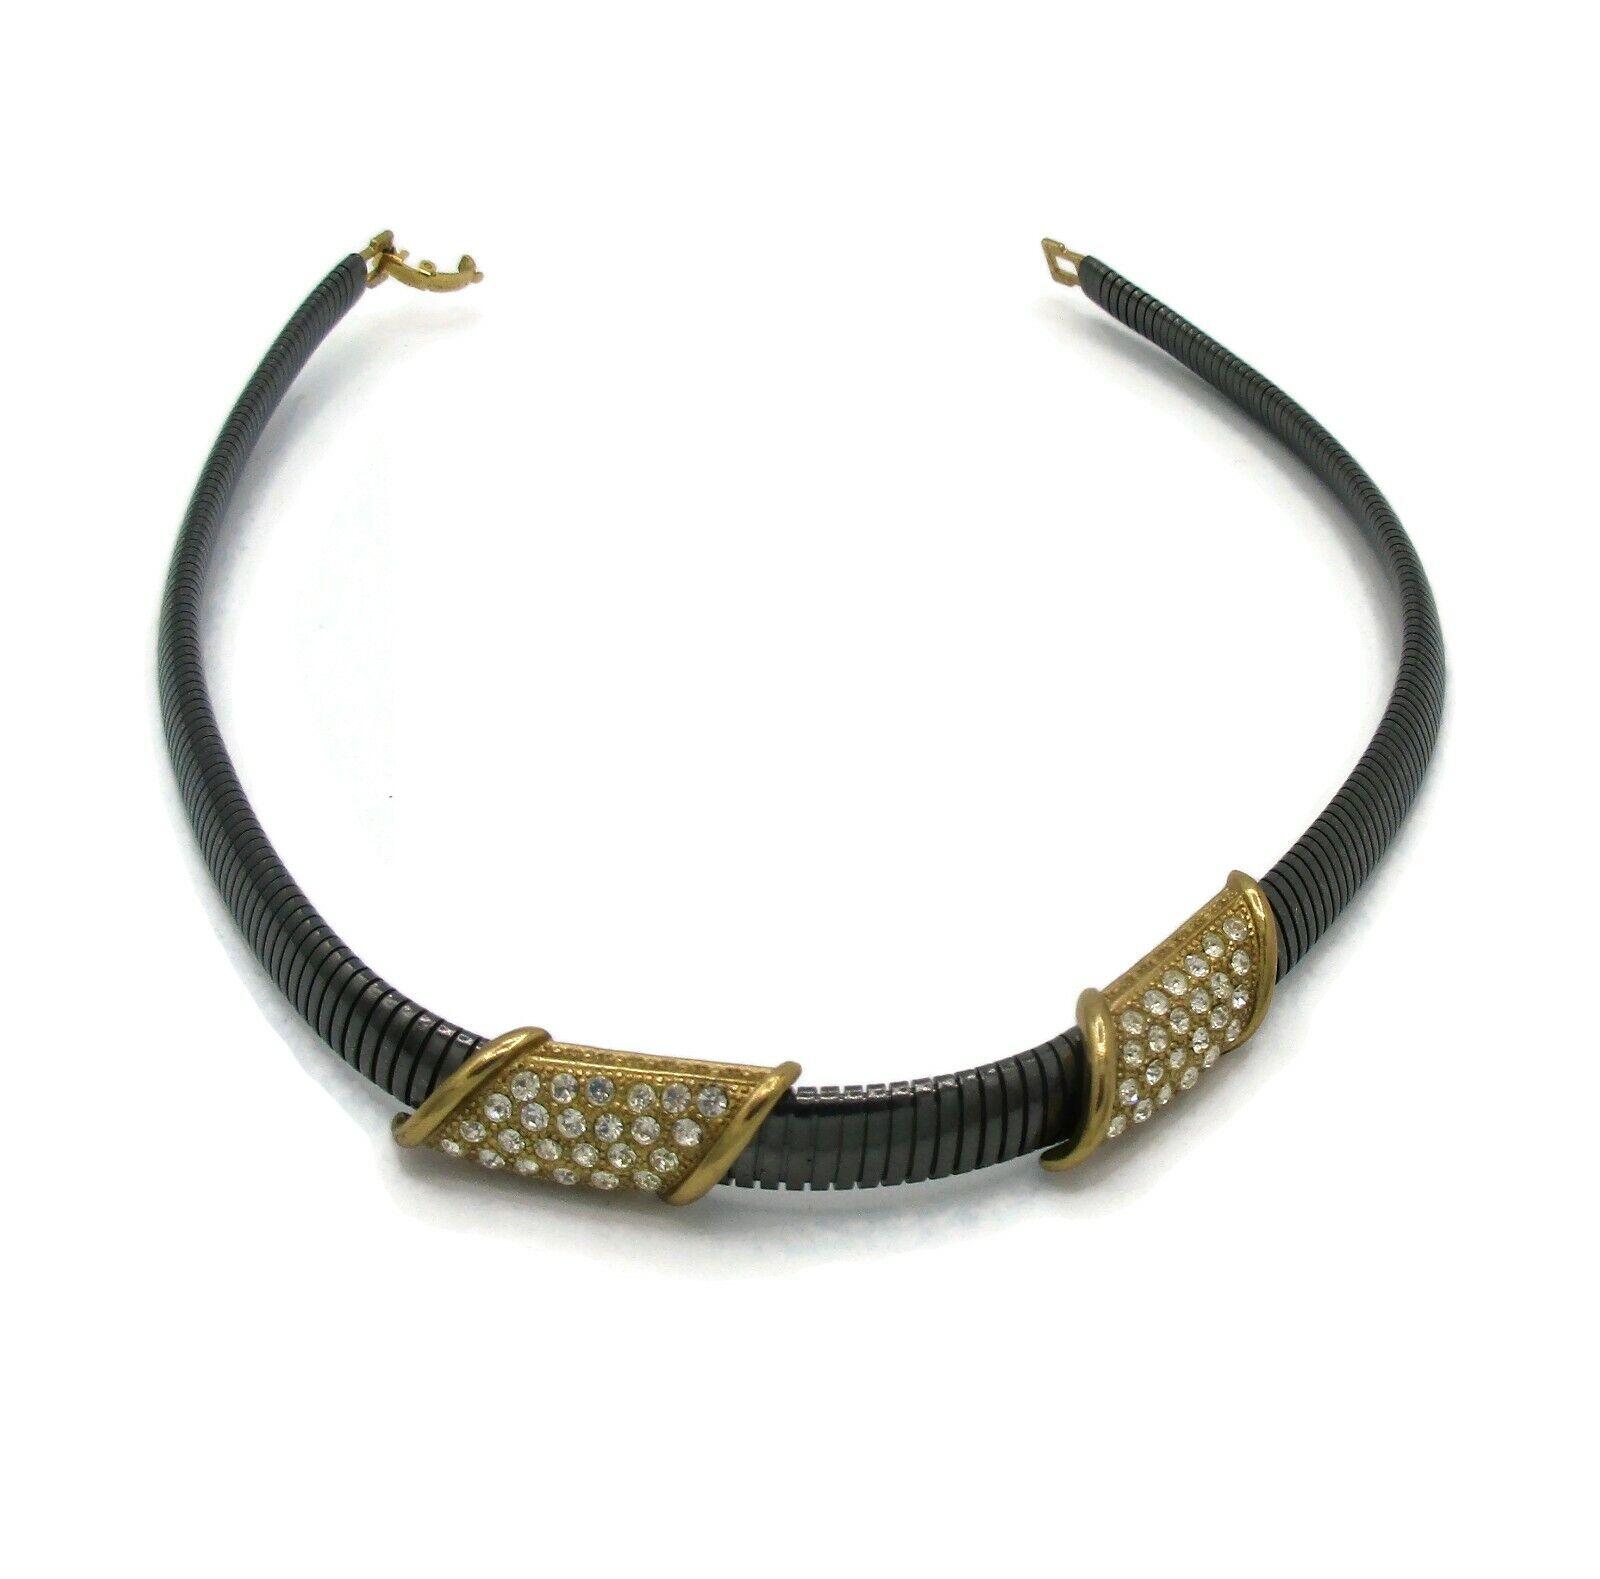 Vintage LANVIN Gun Metal Rhinestone Necklace Earr… - image 1